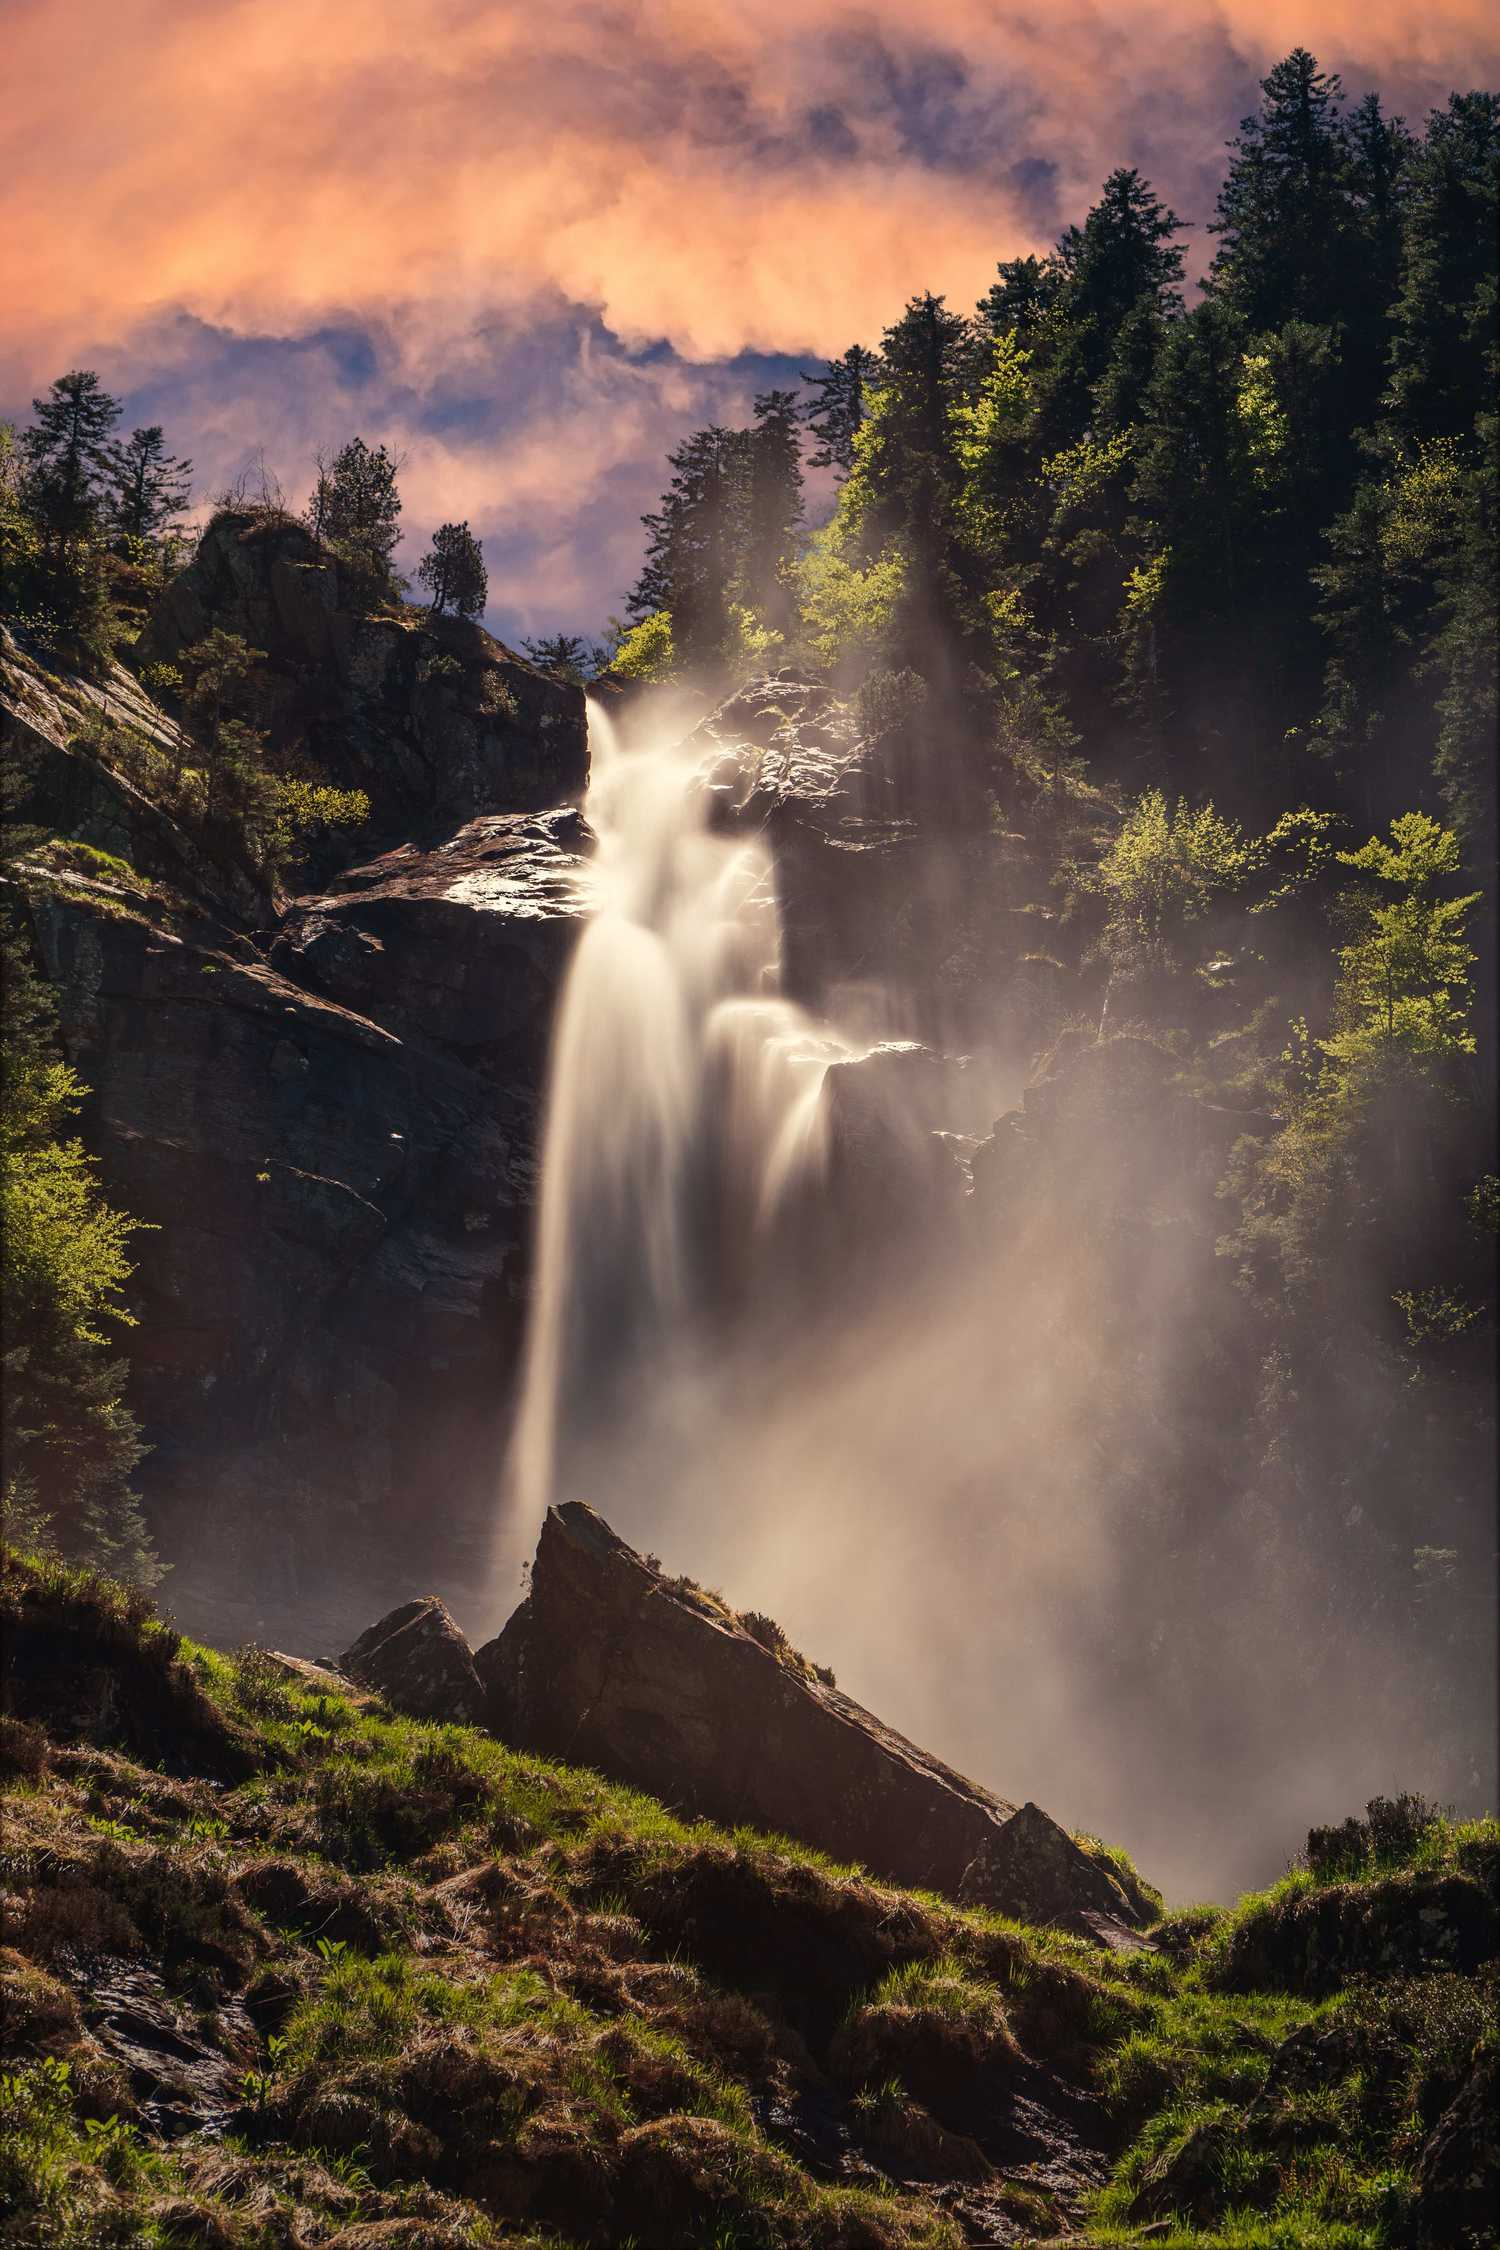 Paisaje nítido de cascadas y niebla